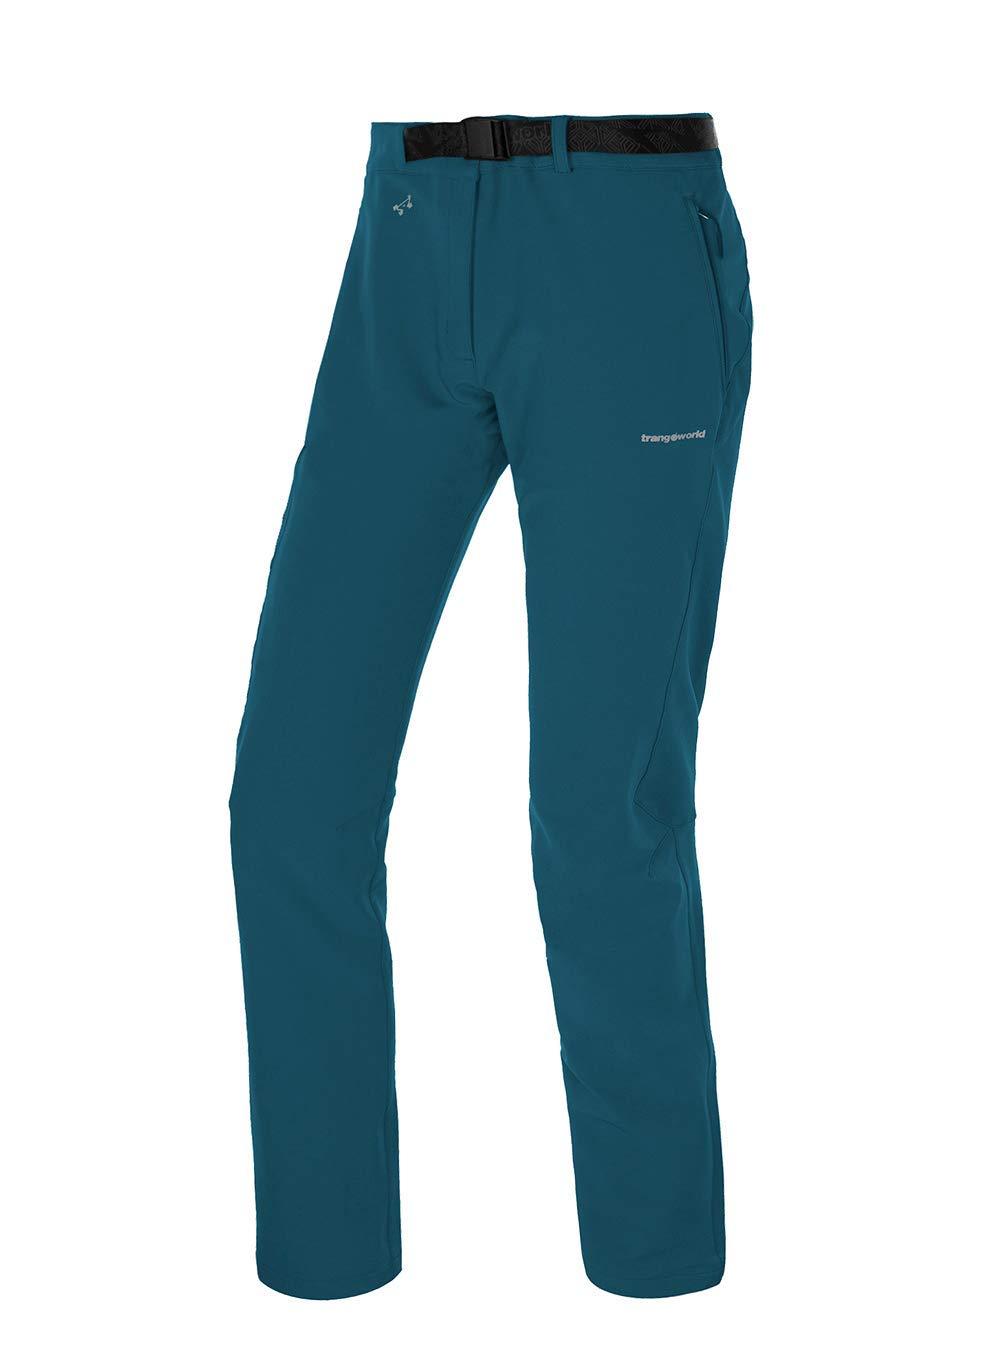 Trangoworld PC008106-4S1-S Damen Lange Hose, tiefblau, S